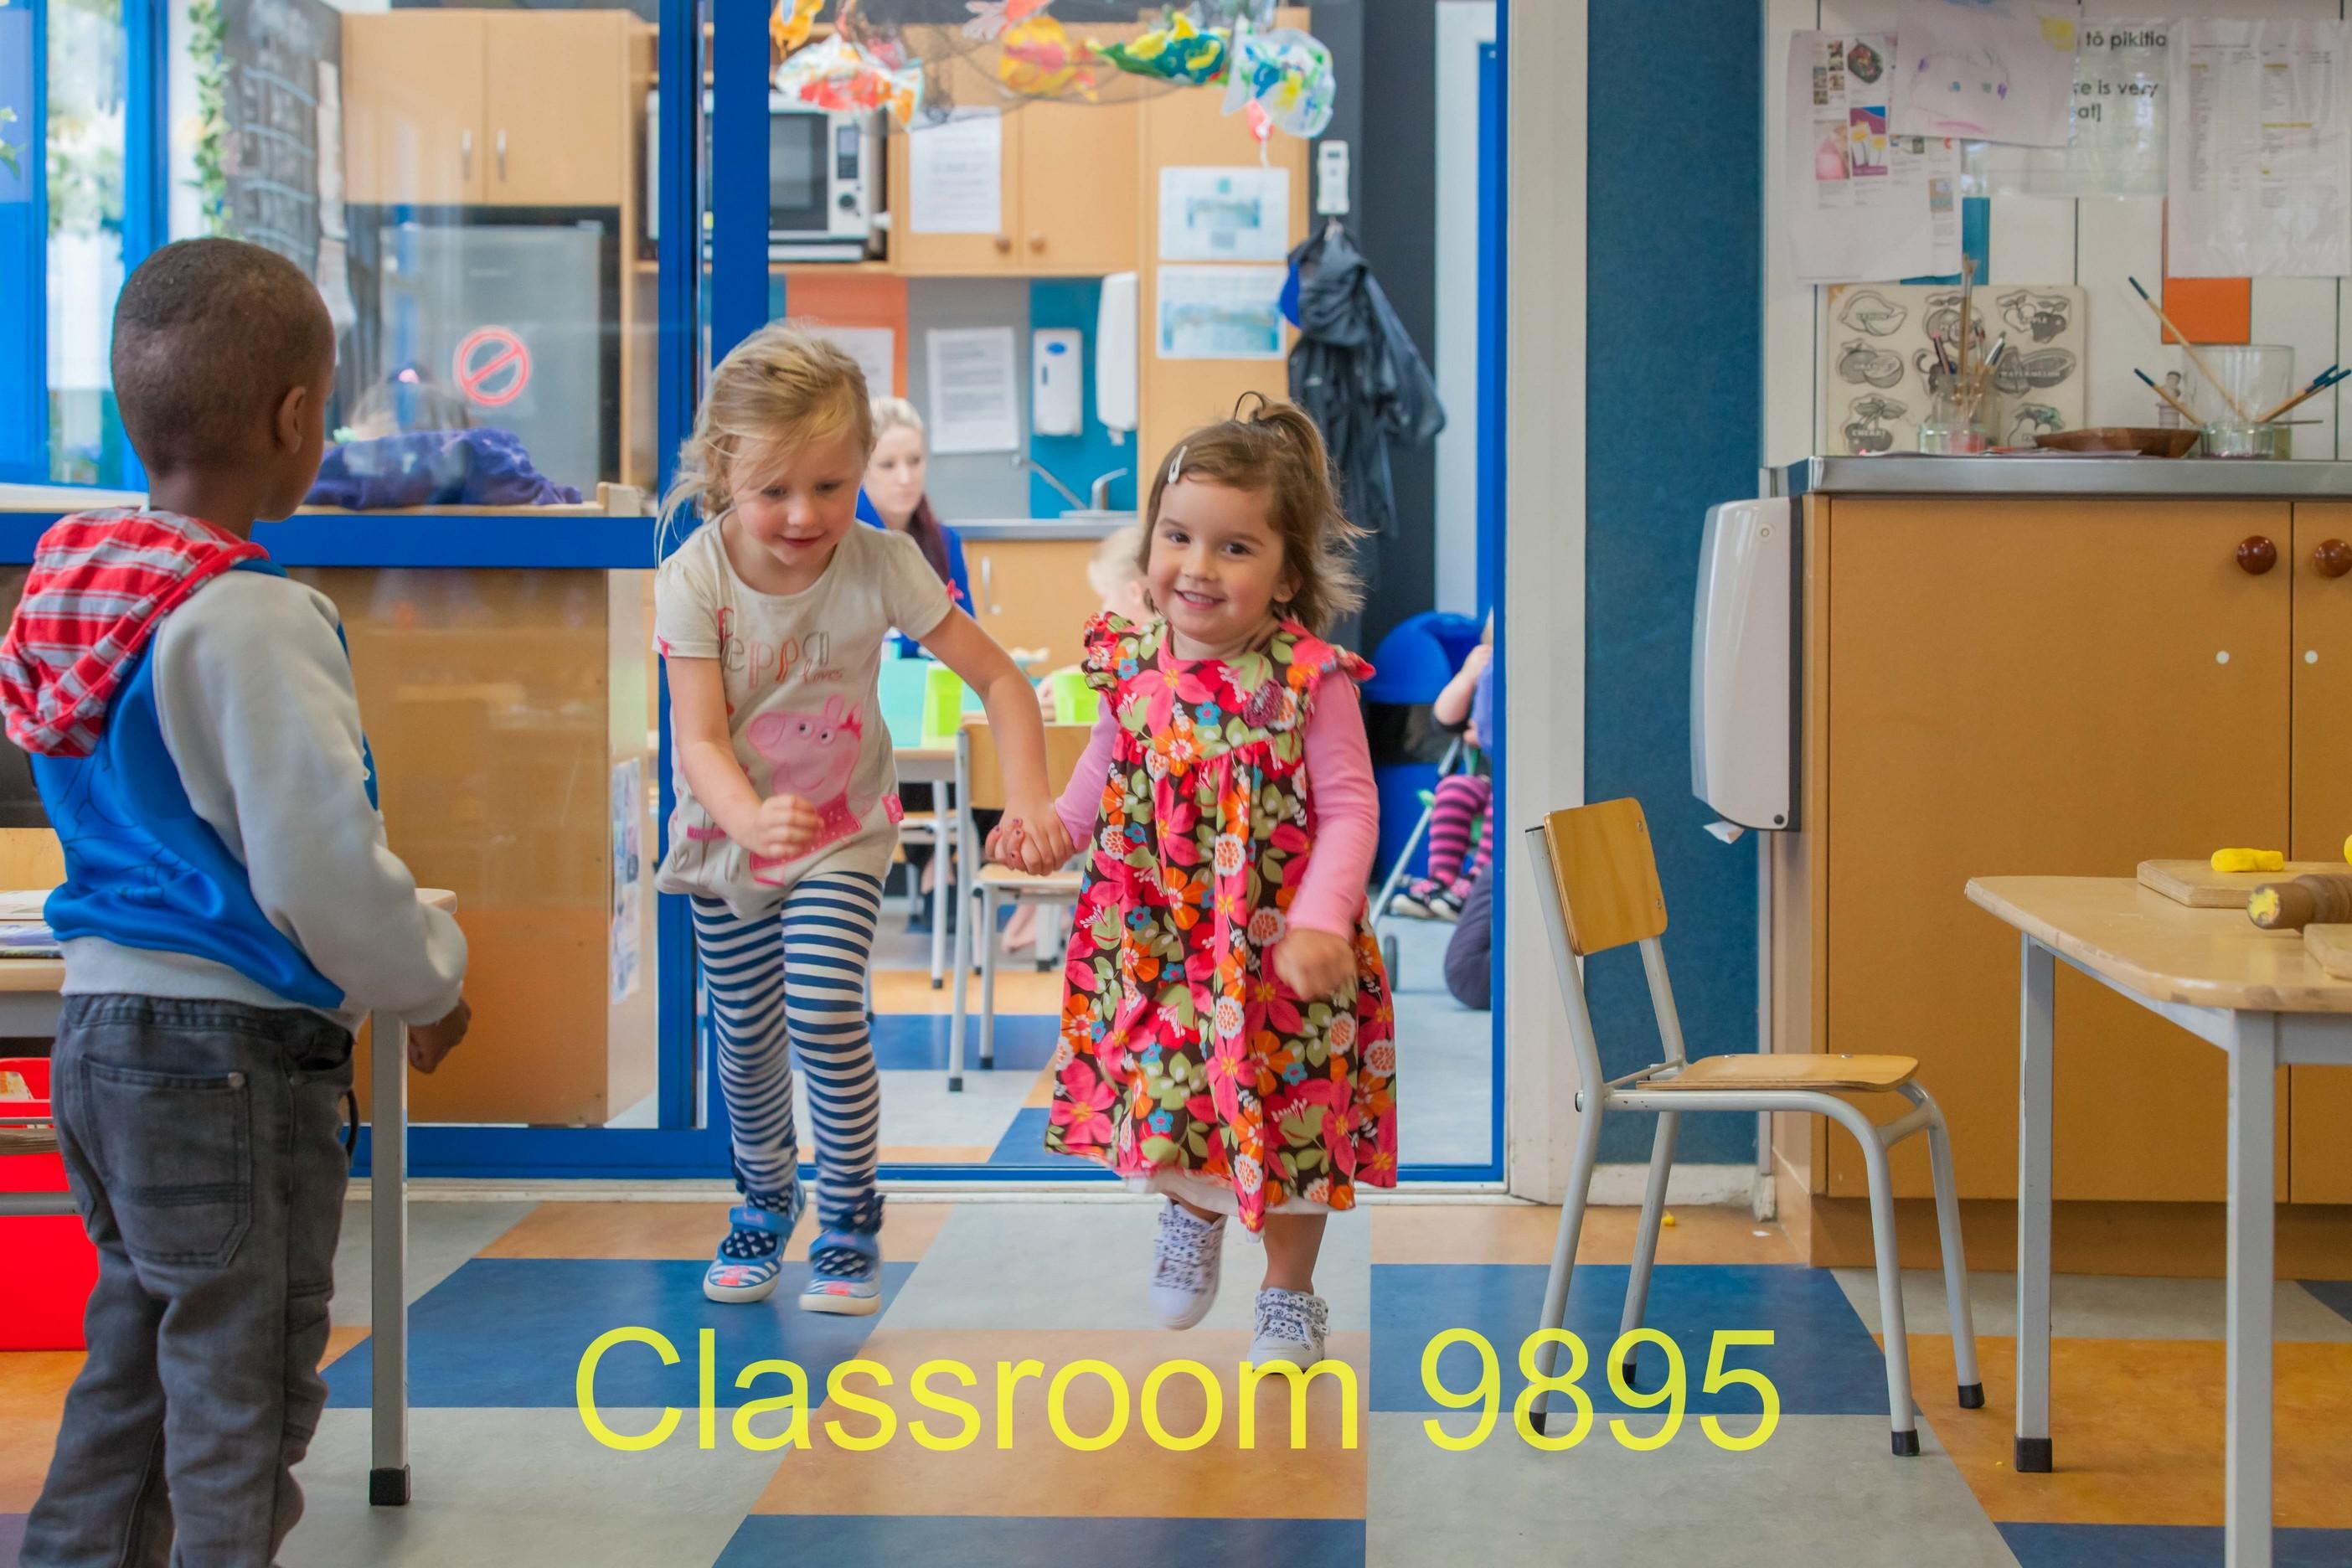 Classroom 9895